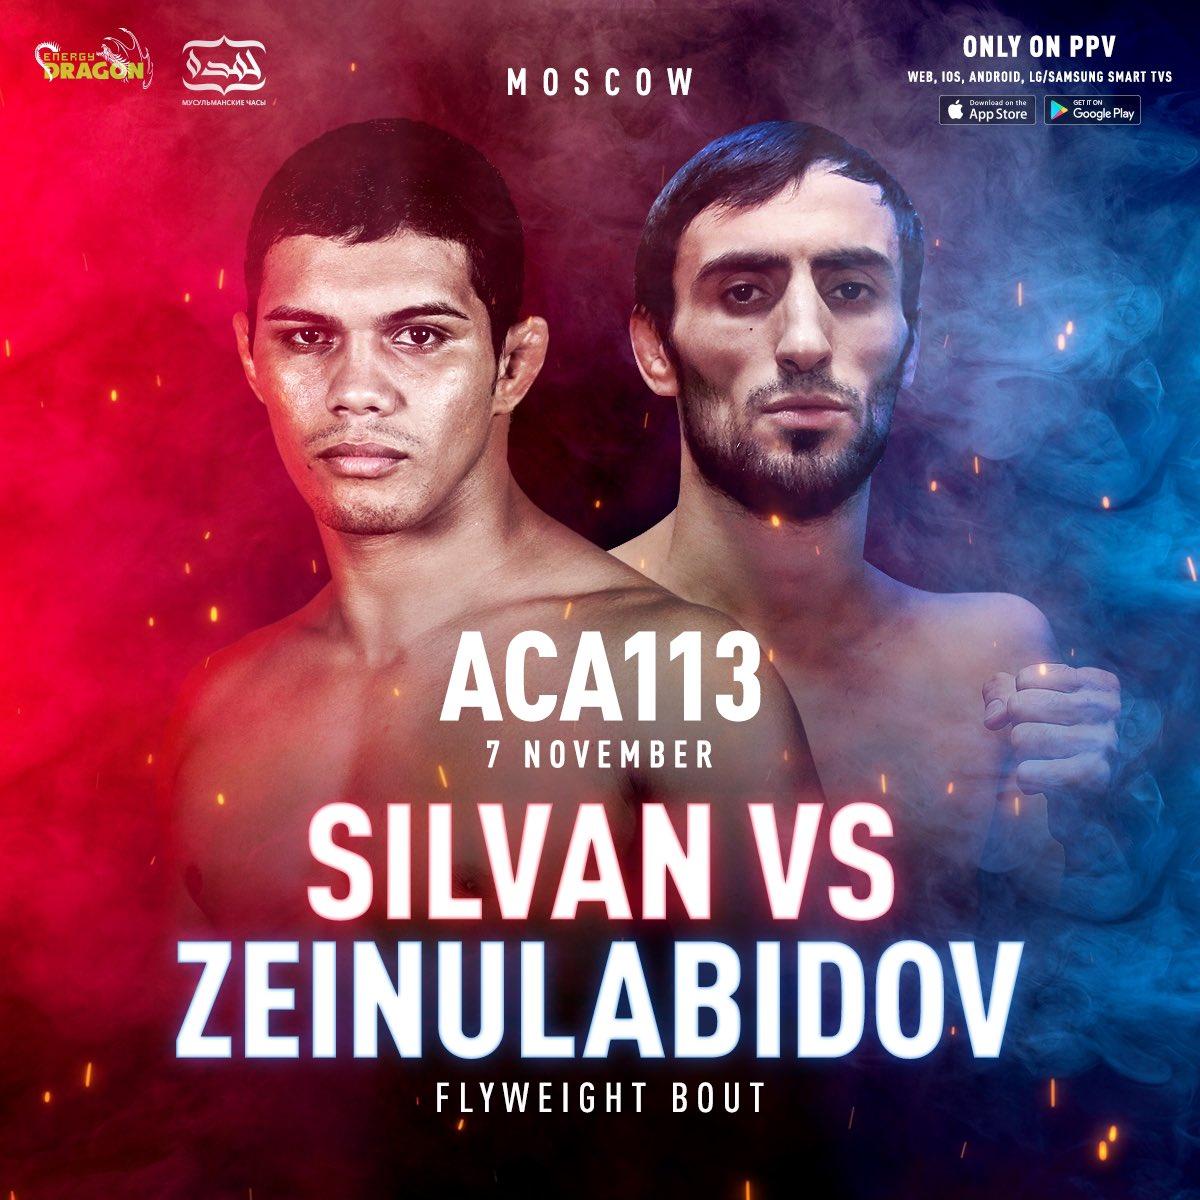 💥 Maycon Silvan (15-3) vs. Murad Zeinulabidov (20-3) on ACA 113! https://t.co/s7fqCpdFkB